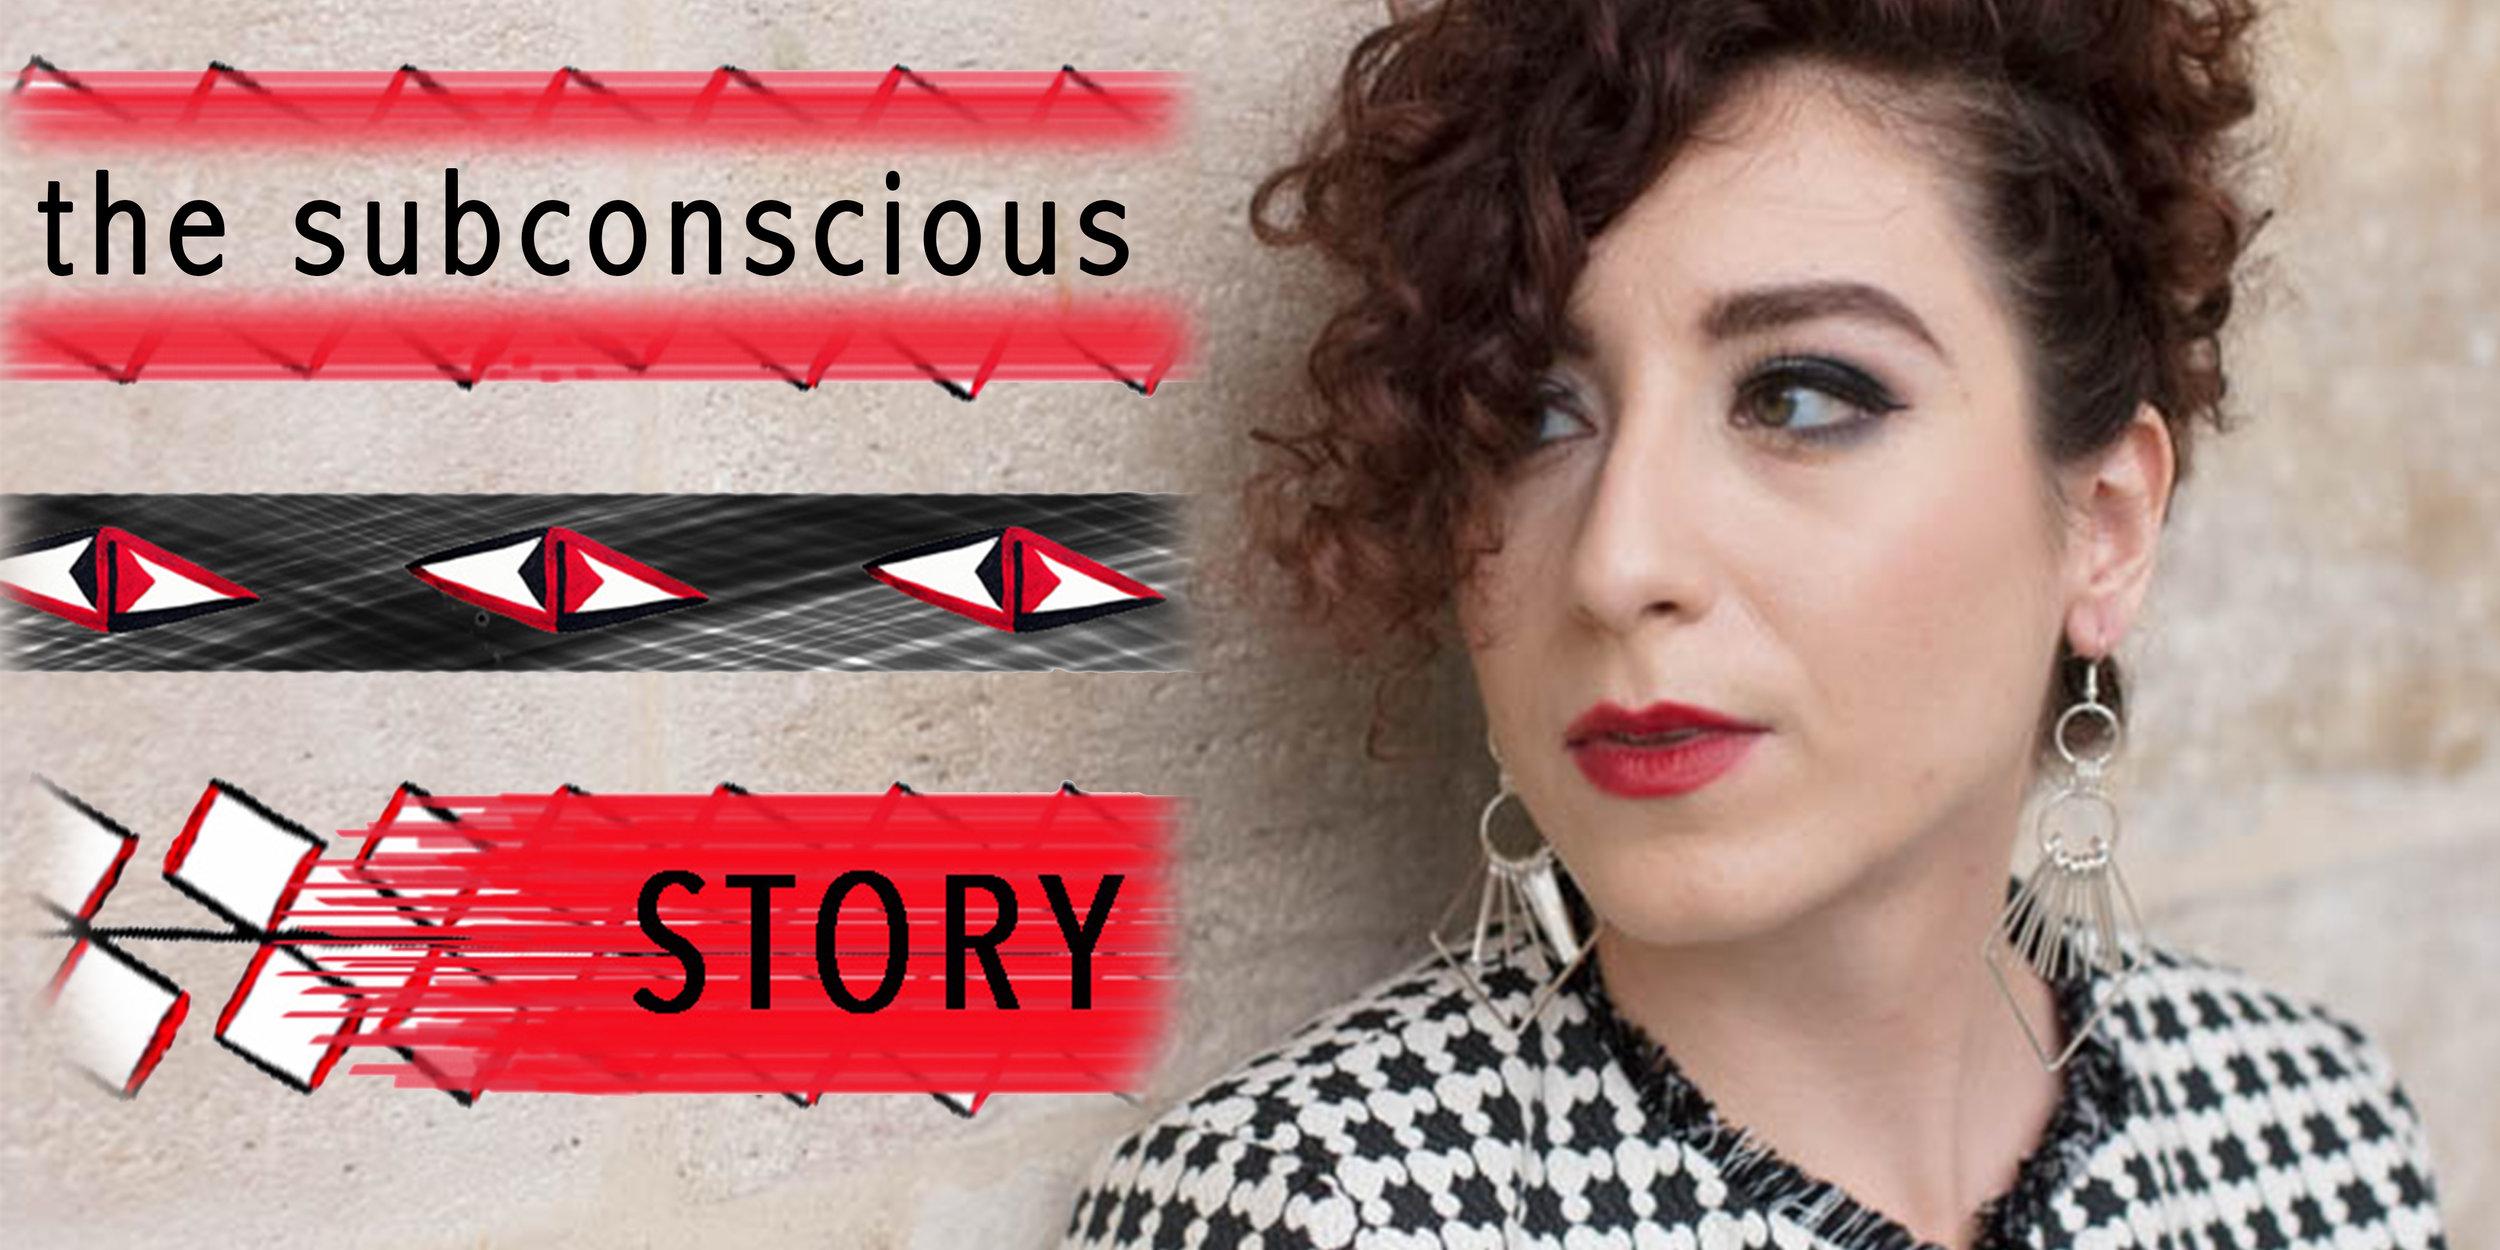 Subconscious Story Image.jpg